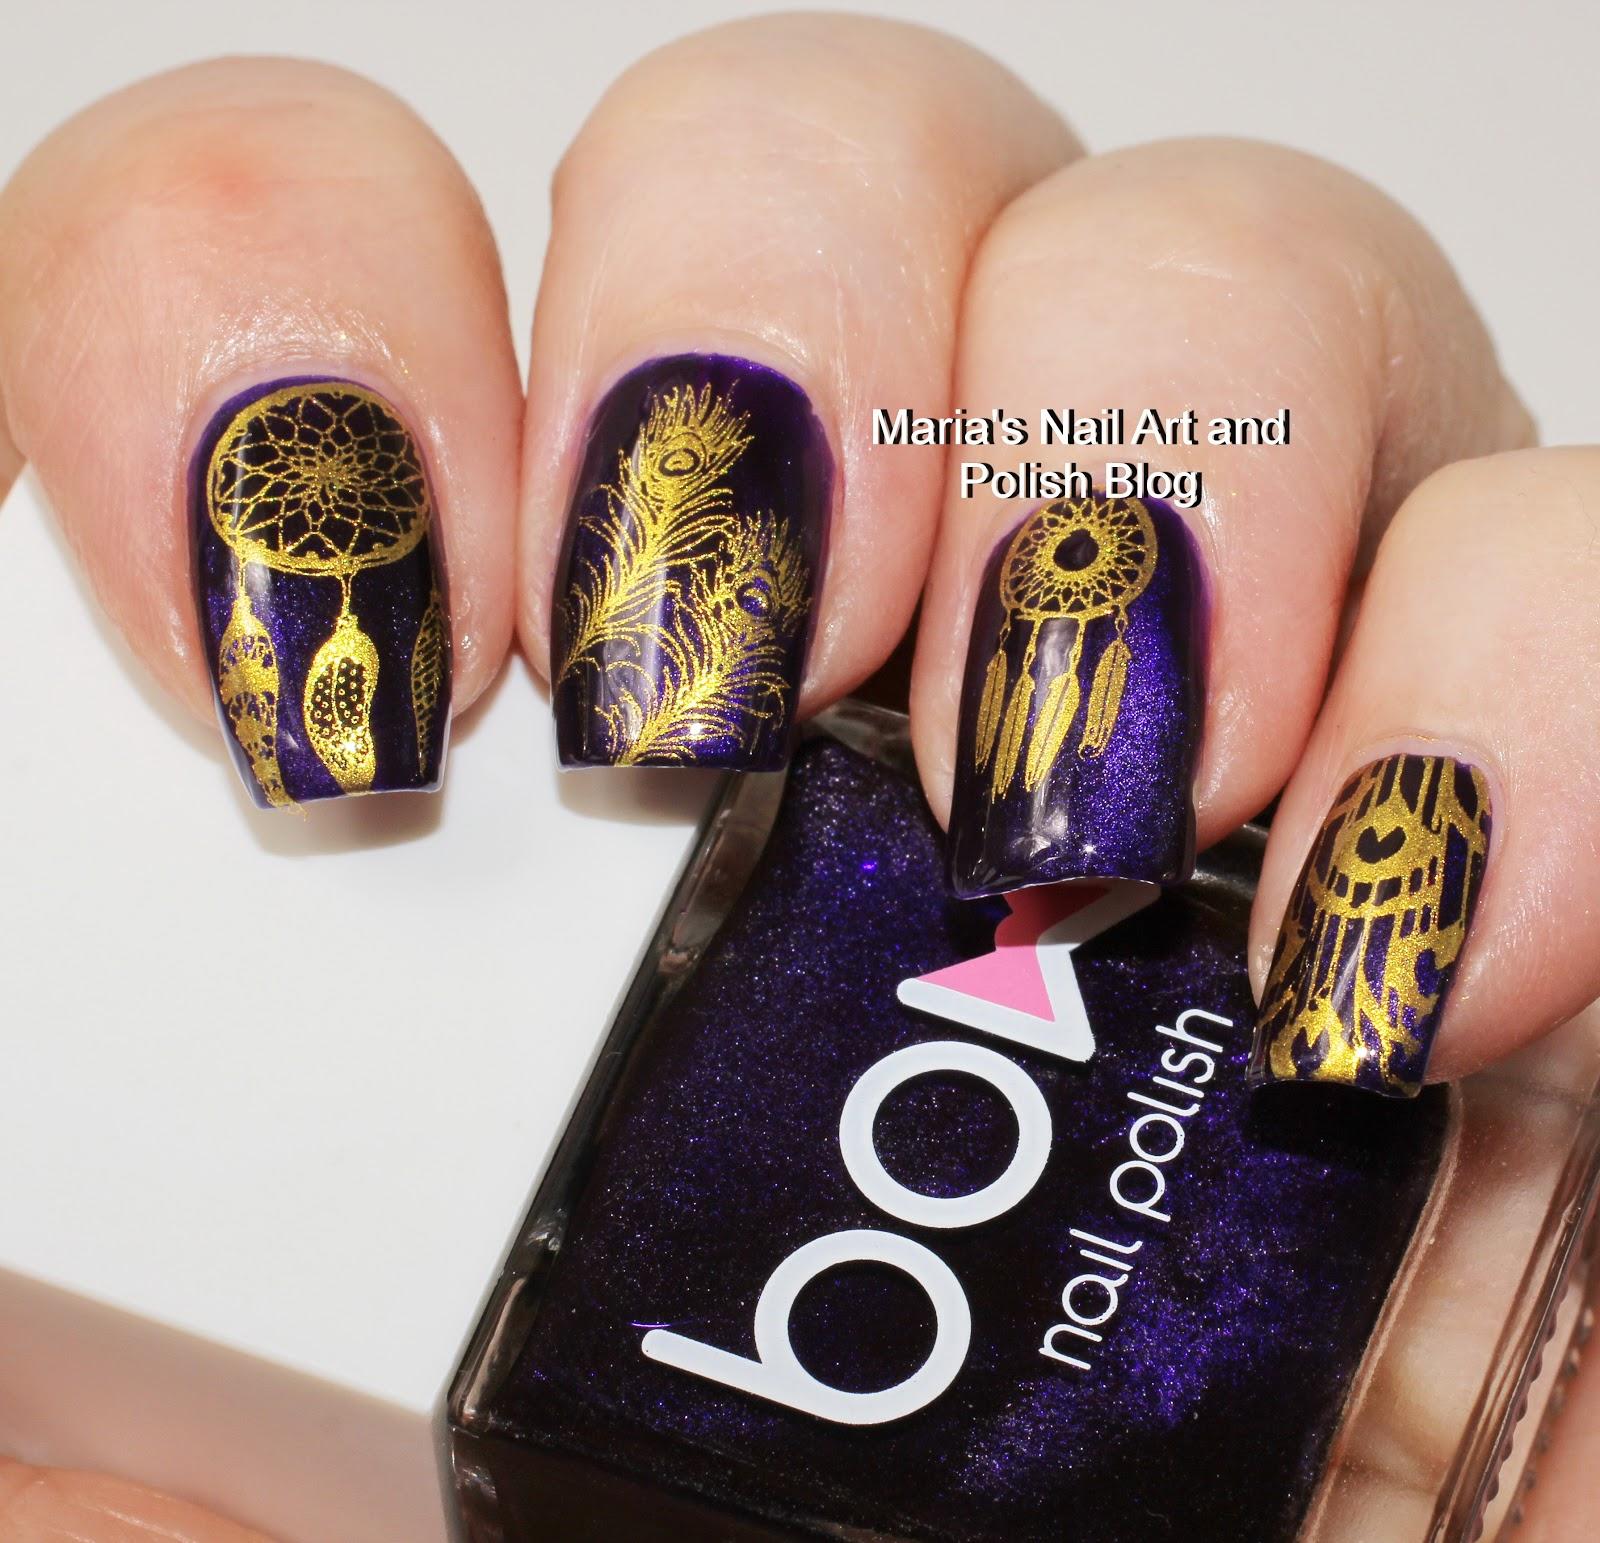 Marias Nail Art and Polish Blog: Born Pretty Store and Ya Quin An ...